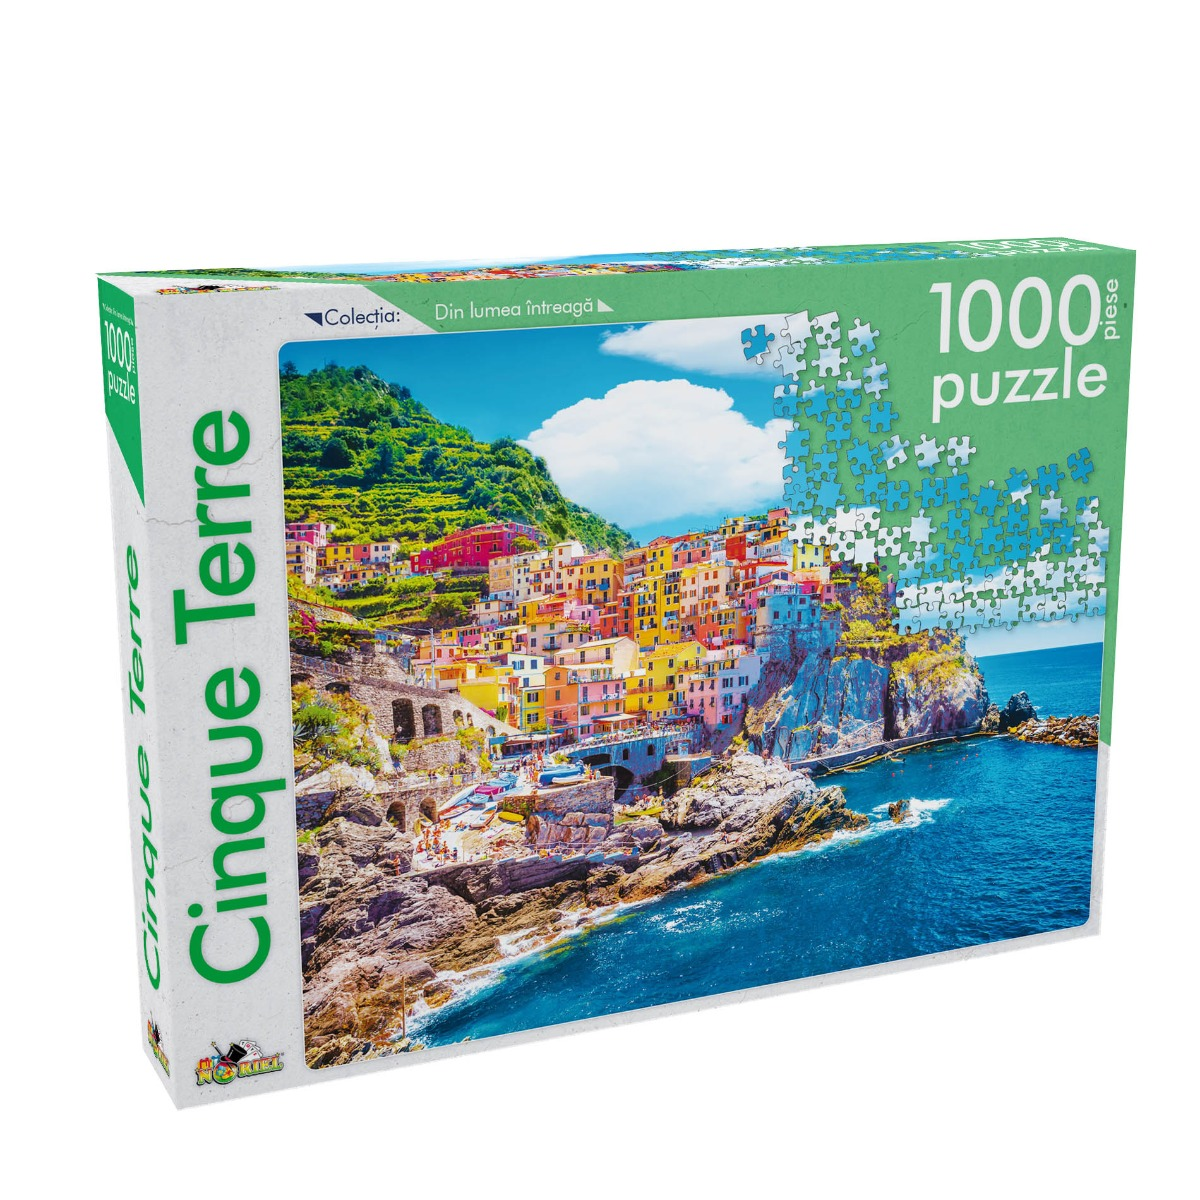 Puzzle Noriel - Din lumea intreaga - Cinque Terre imagine 2021